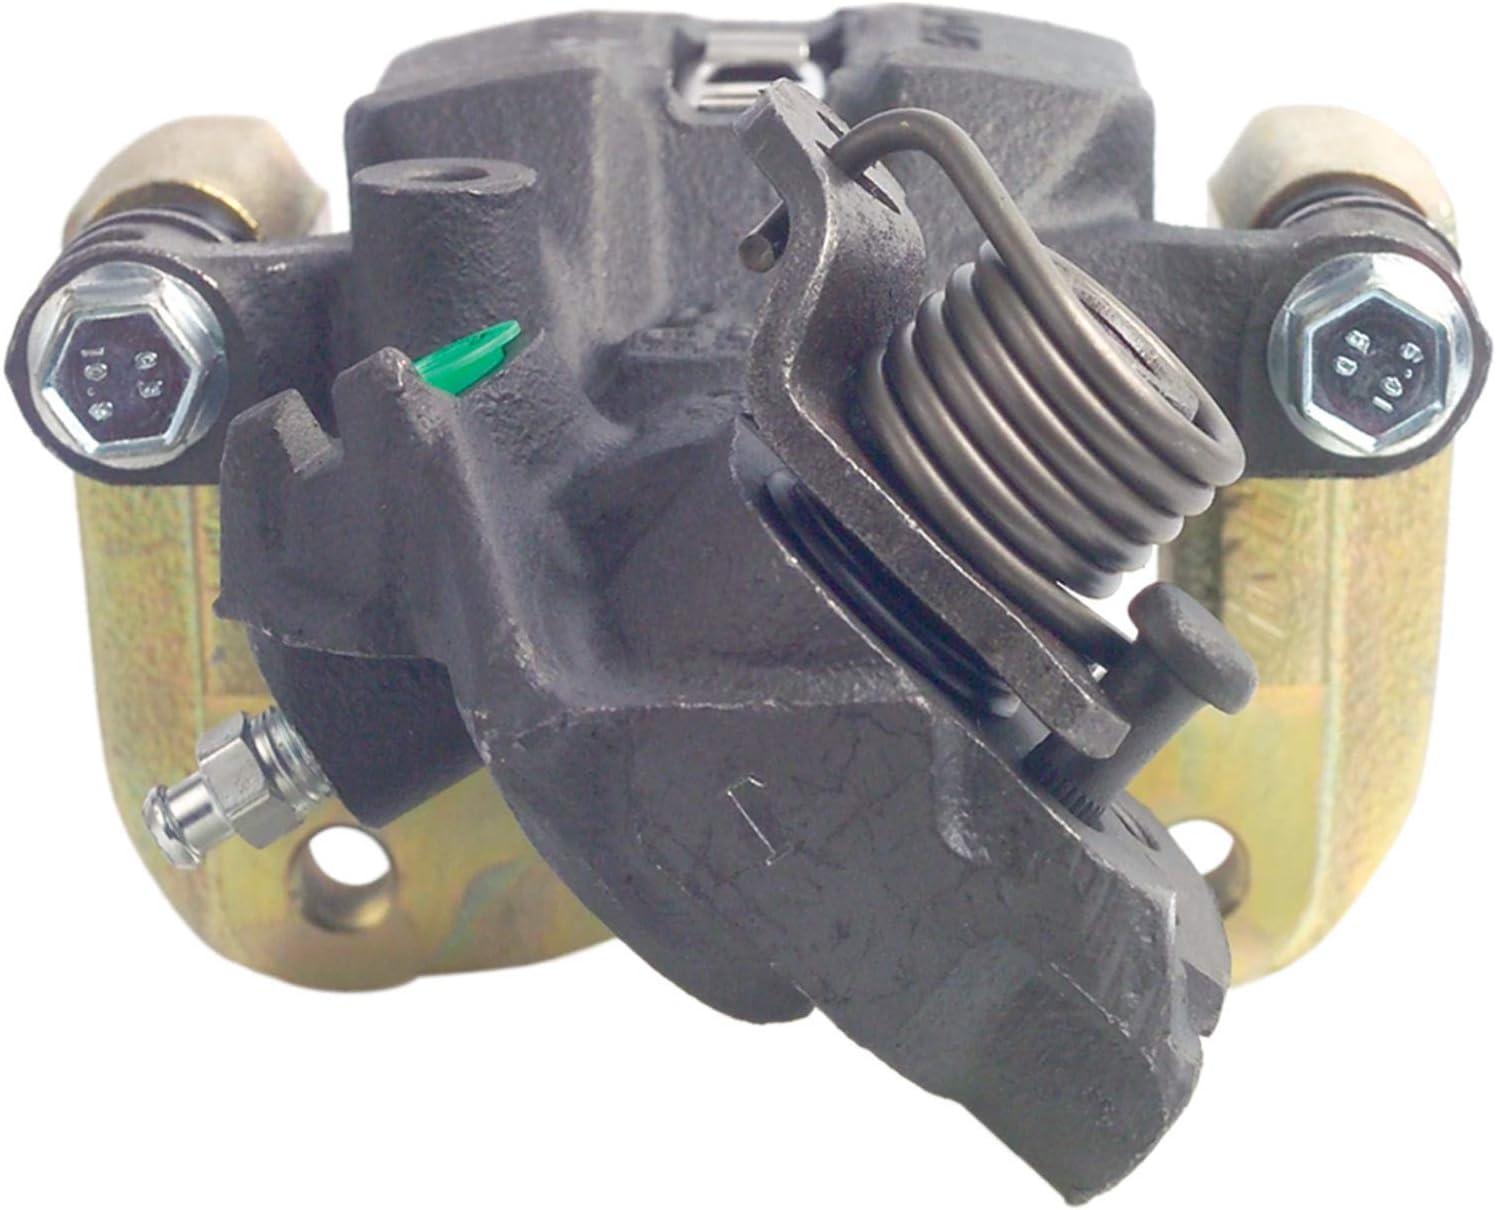 Brake Caliper Unloaded Cardone 19-B1612 Remanufactured Import Friction Ready